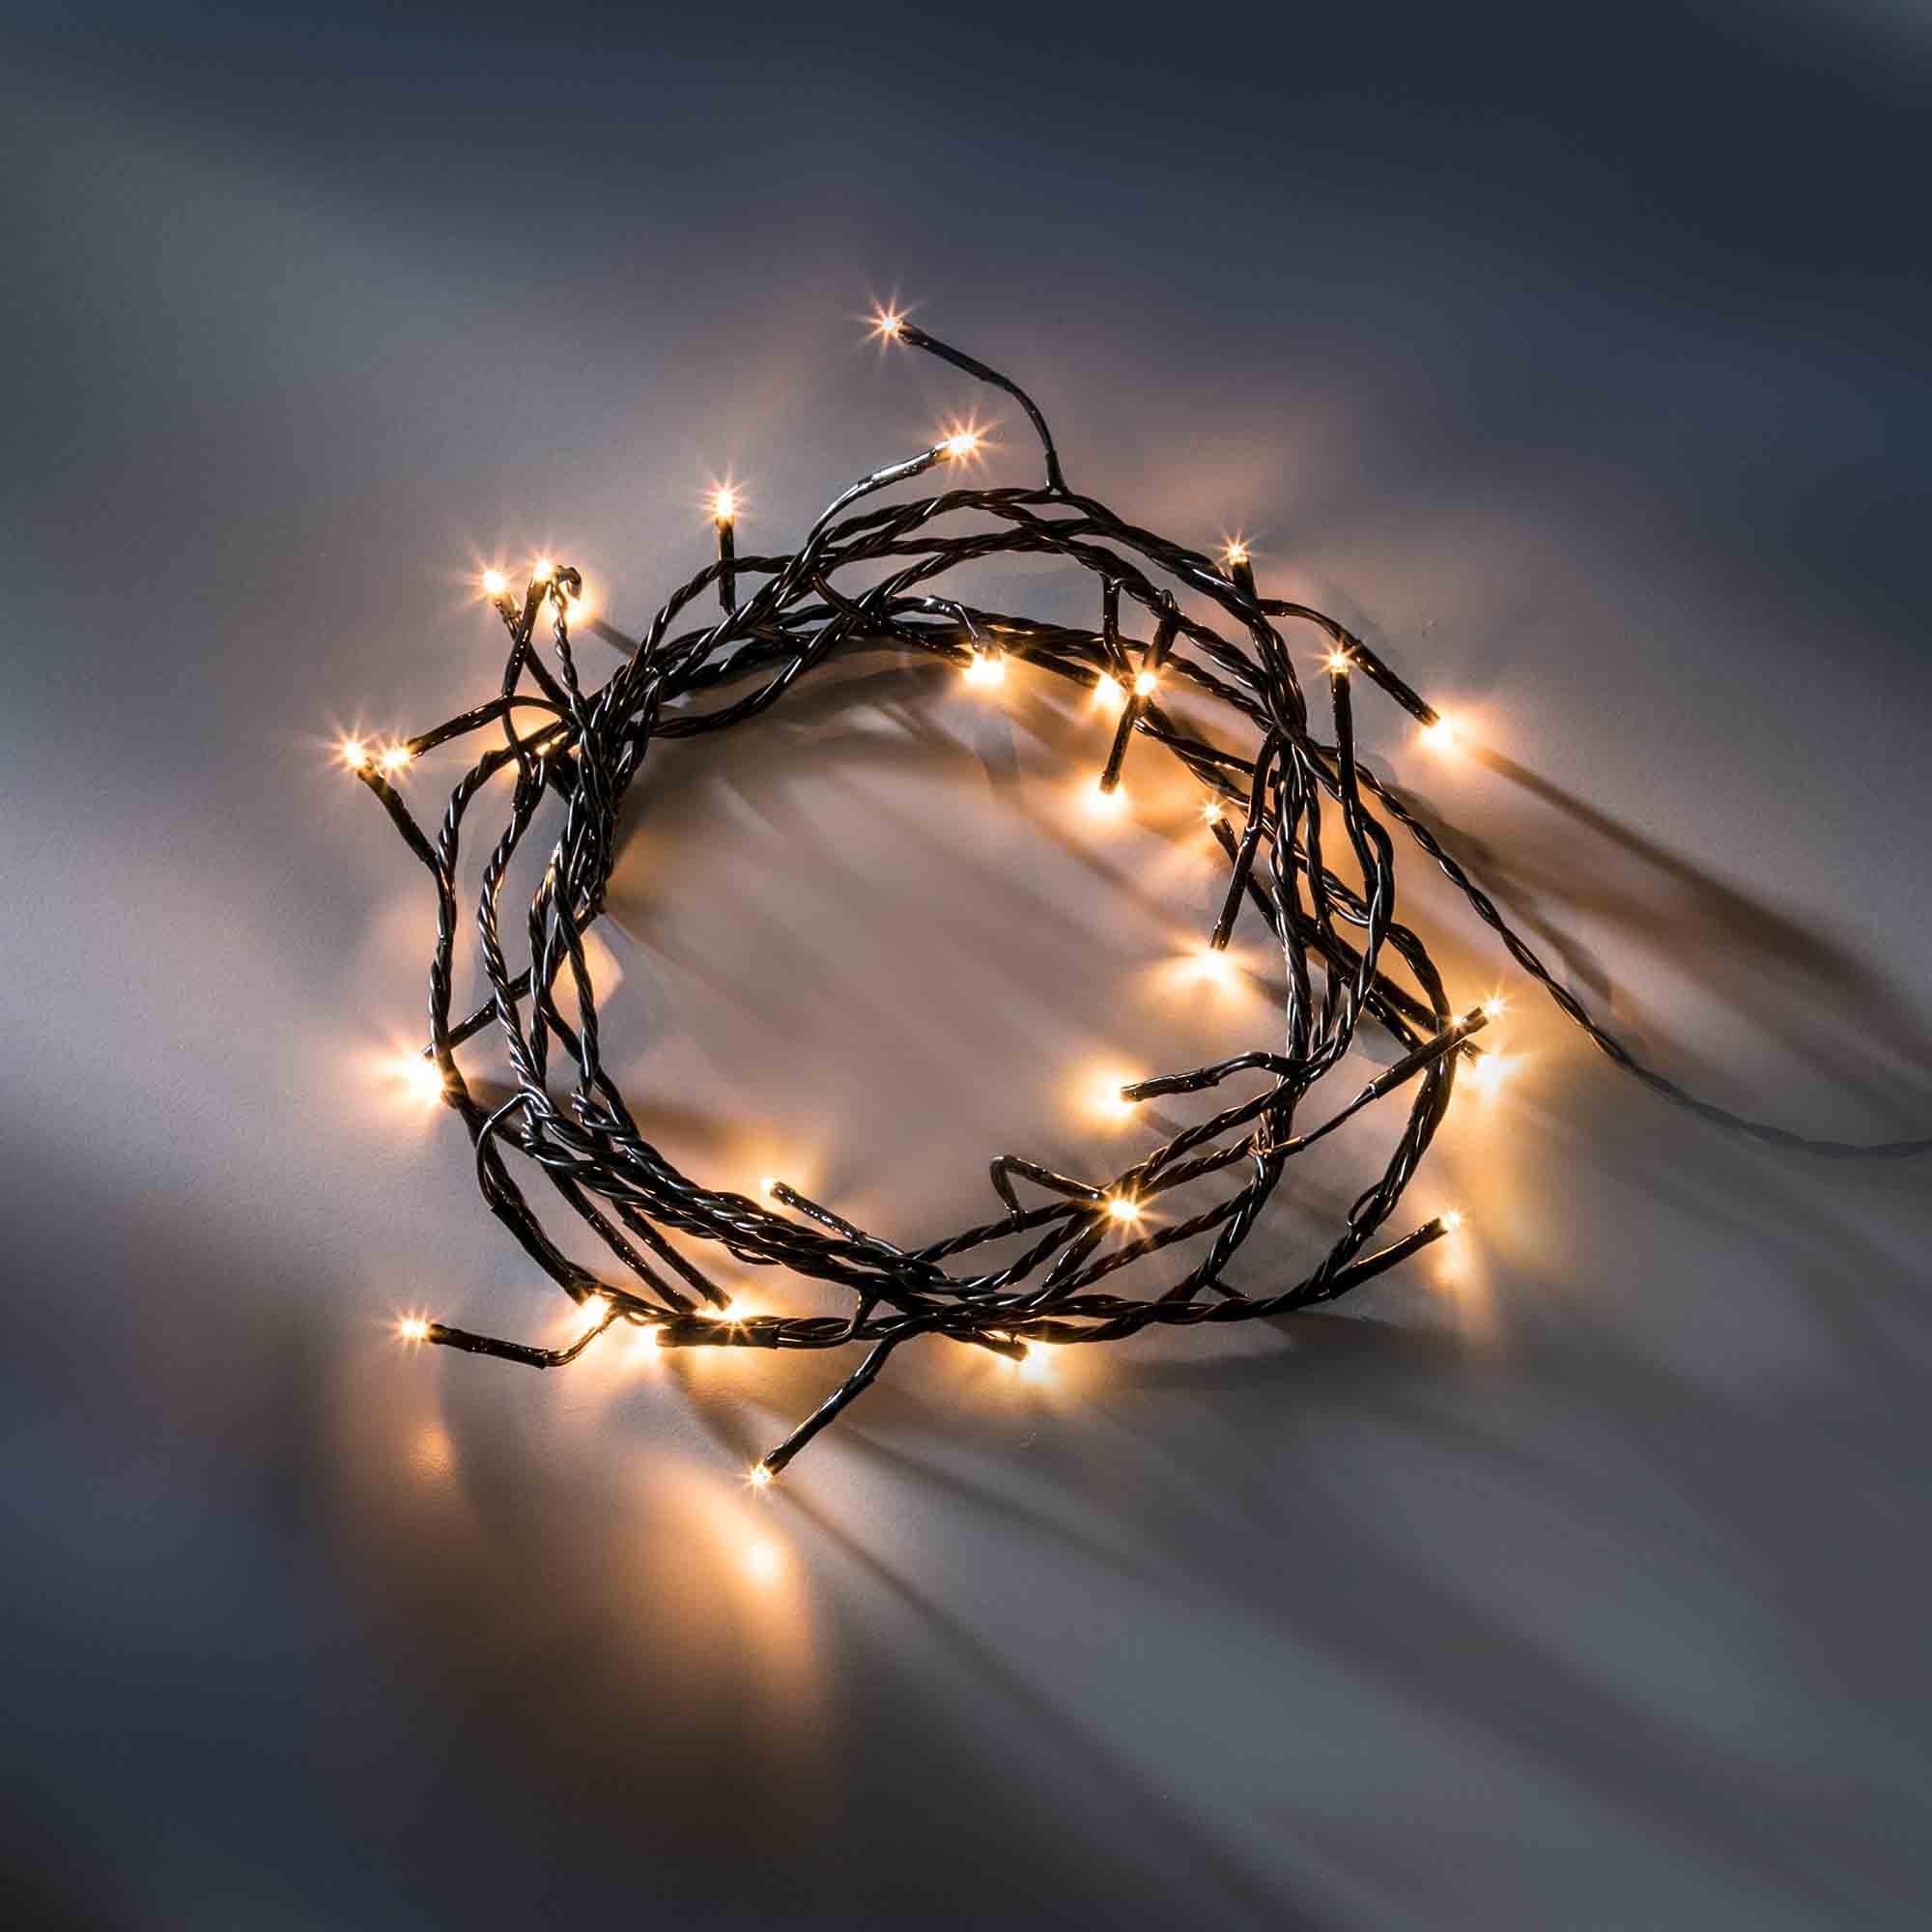 KAEMINGK Lumineo LED-Lichterkette mit acht Funktionen, klassisch warm, 36 m, 480 LEDs 493088